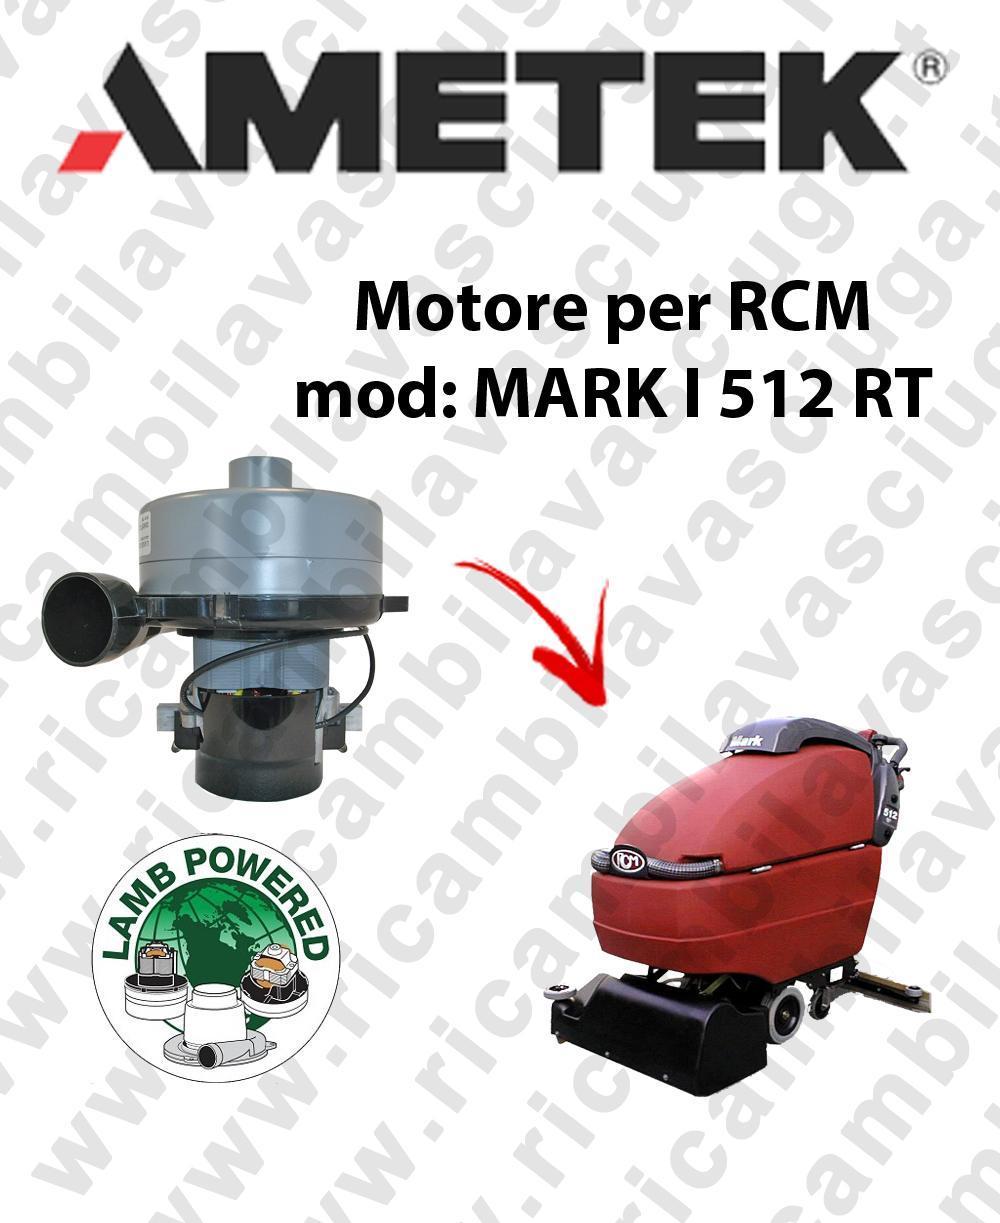 MARK I 512 RT motor de aspiración LAMB AMETEK fregadora RCM